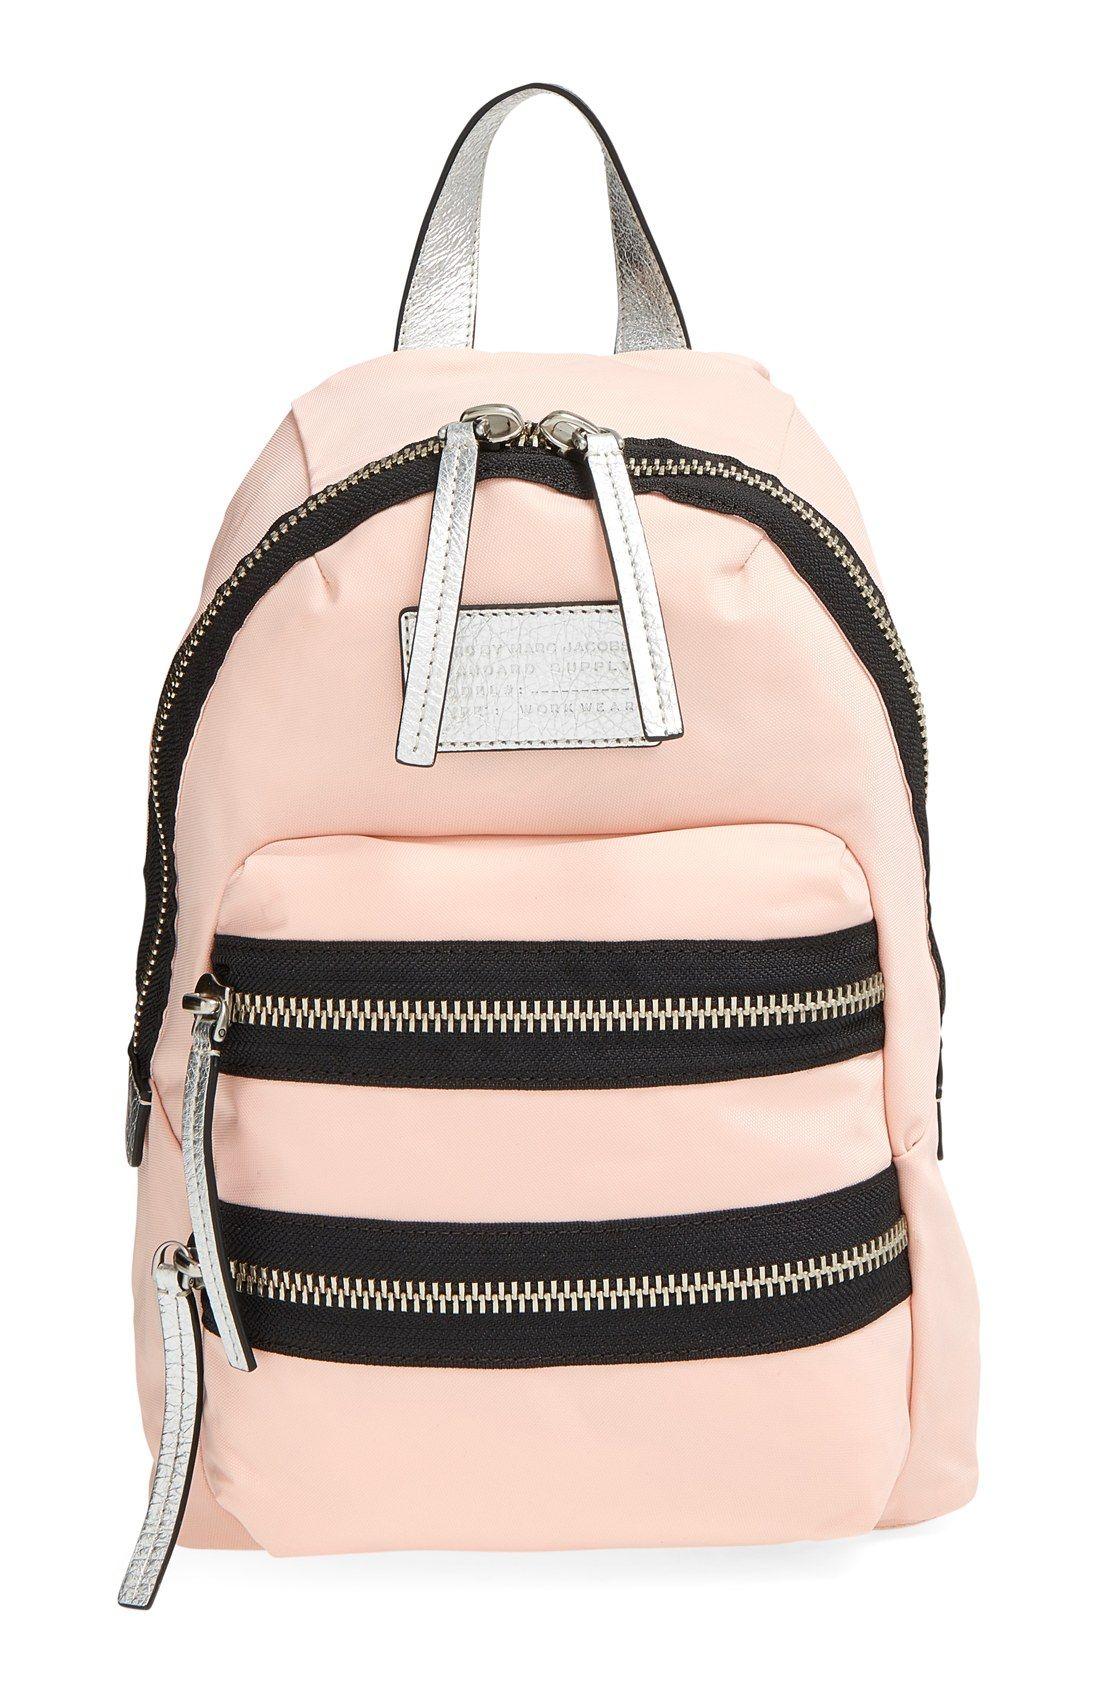 17cdb6502d74 Marc By Marc Jacobs Mini Packrat Nylon Backpack